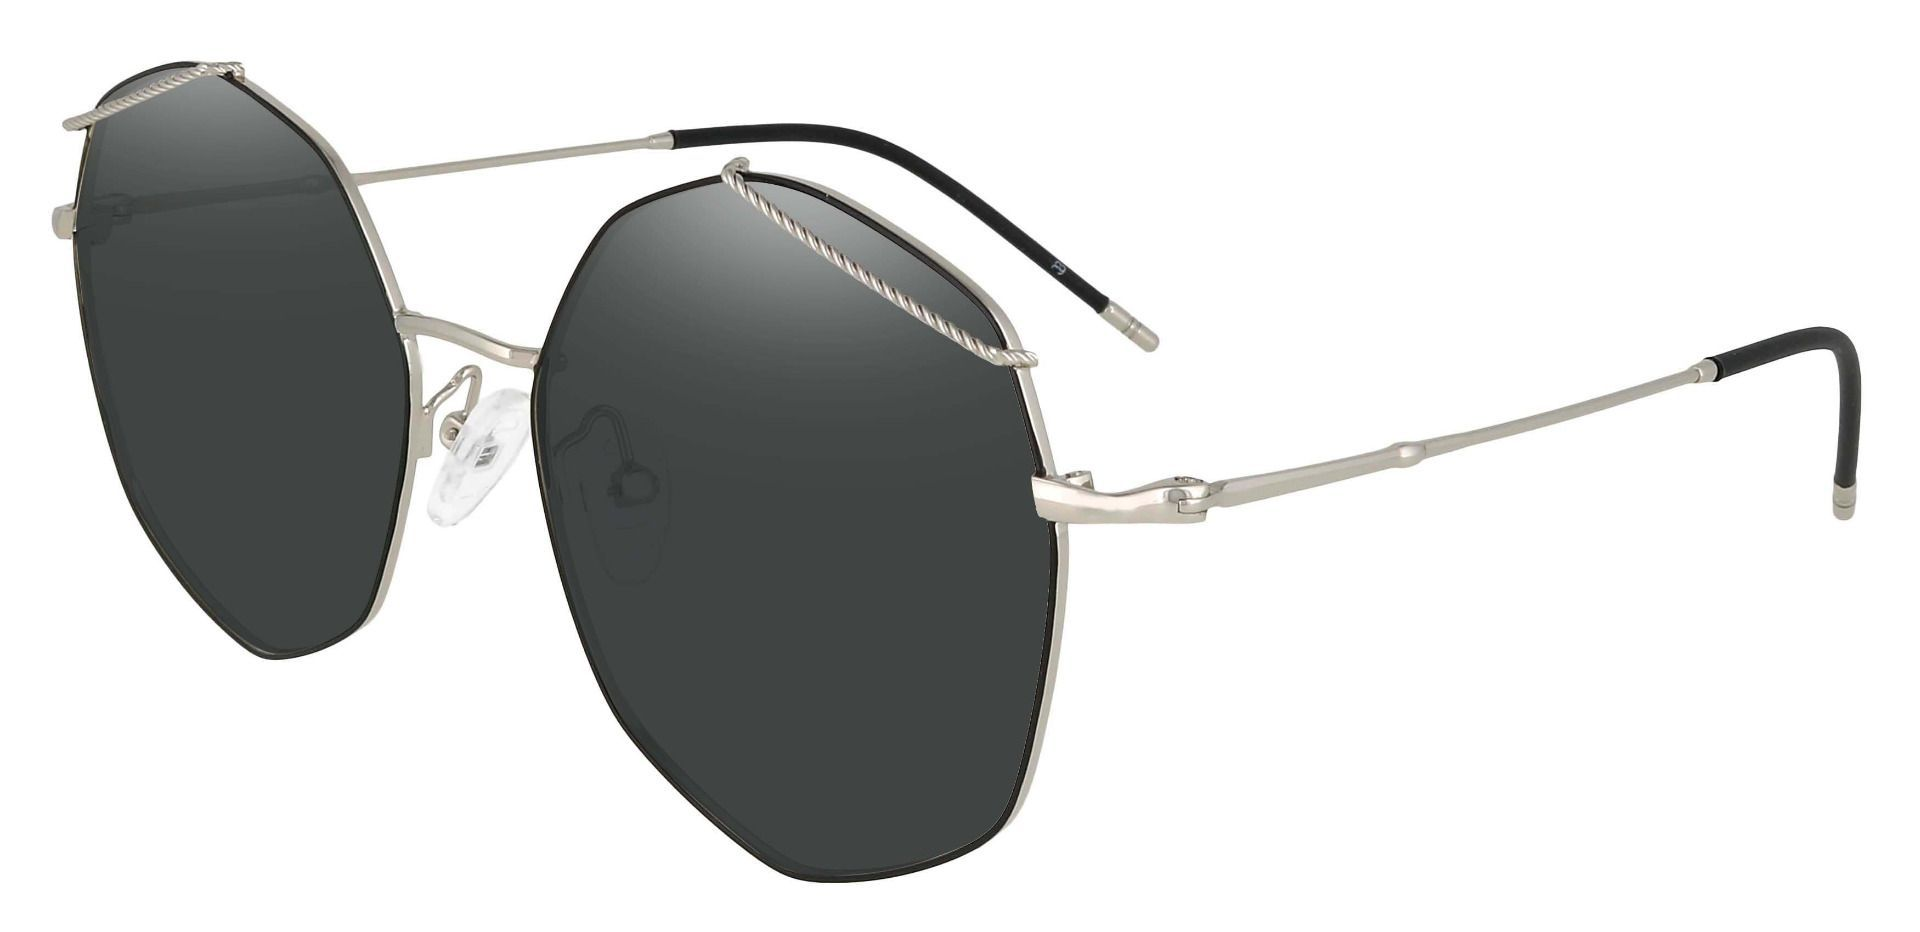 Tango Geometric Lined Bifocal Sunglasses - Black Frame With Gray Lenses